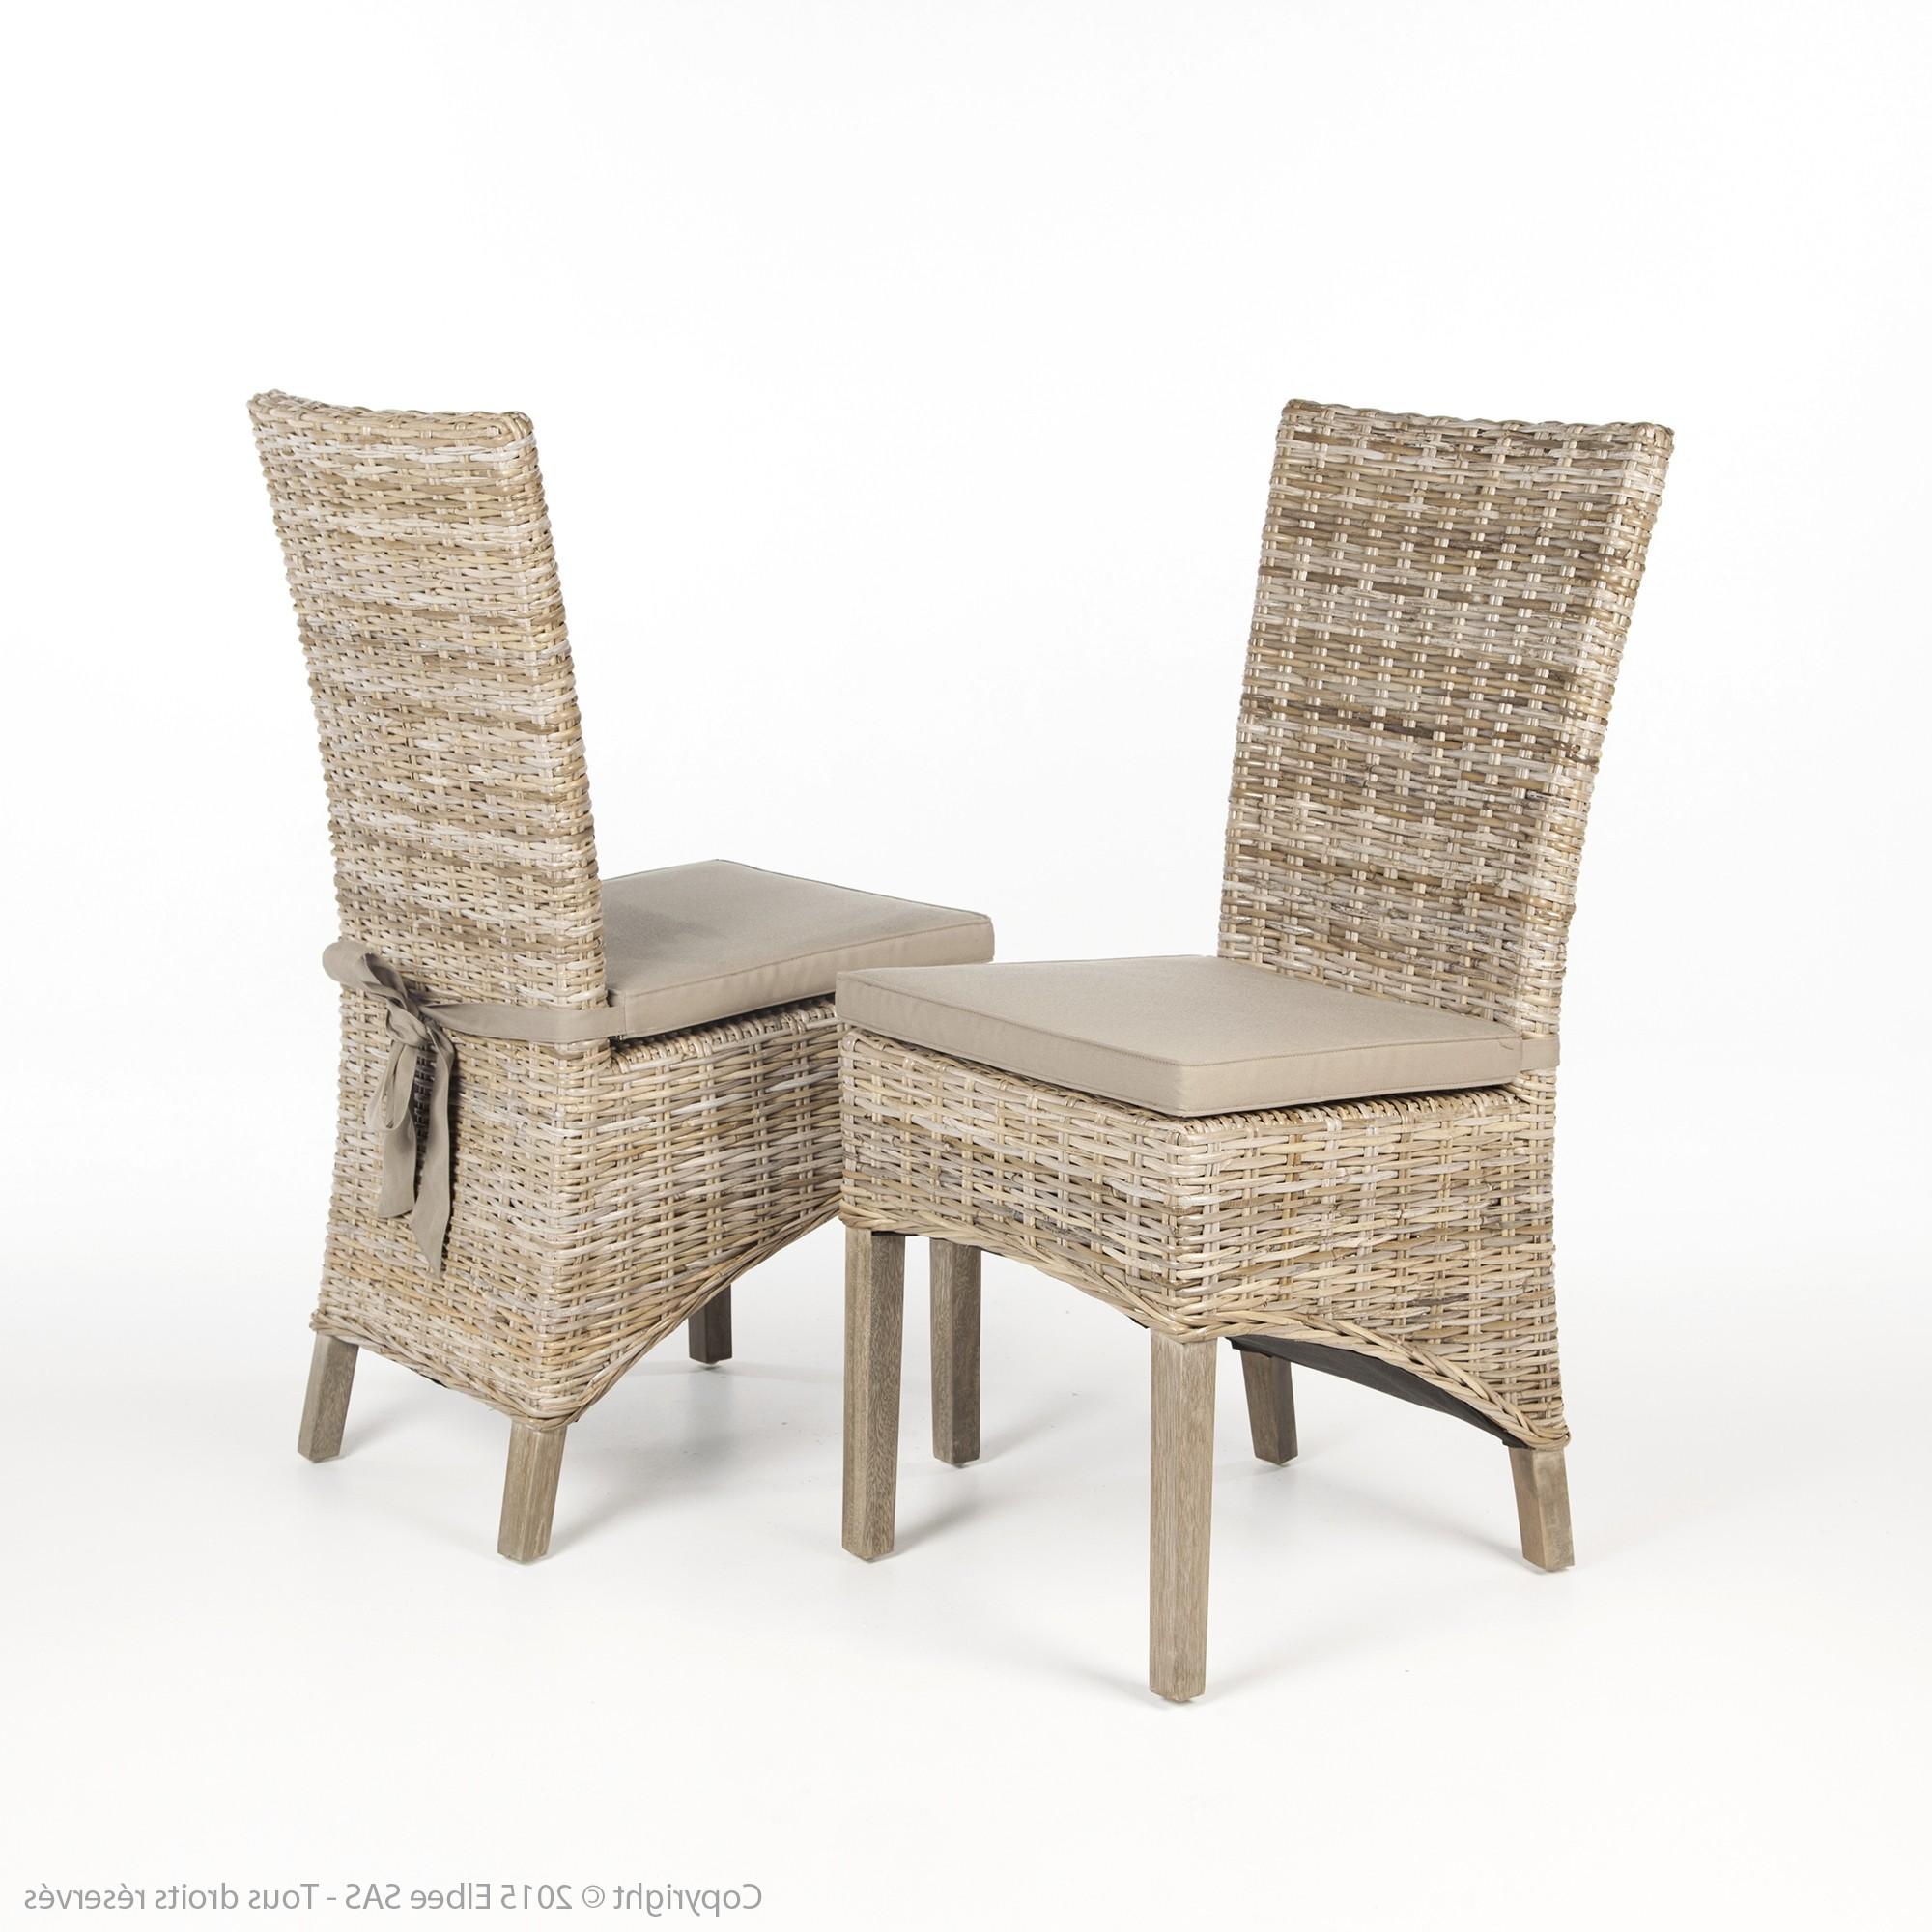 Chaise en kubu tresse conceptions de maison for Chaise en rotin kubu